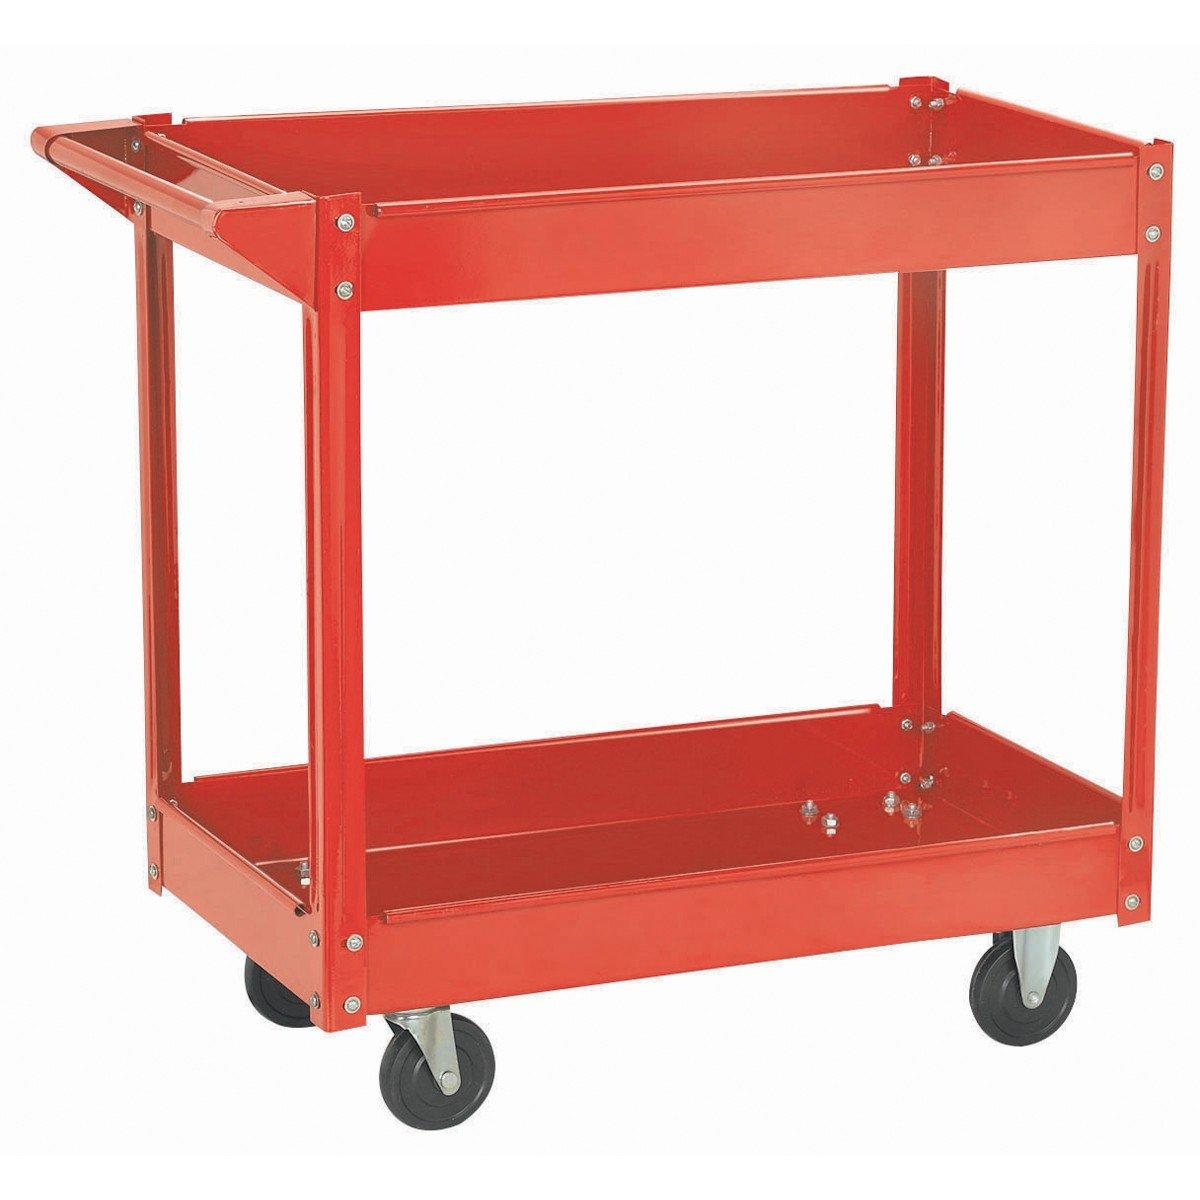 Northern Industrial Service Cart - 600-Lb. Capacity, Steel